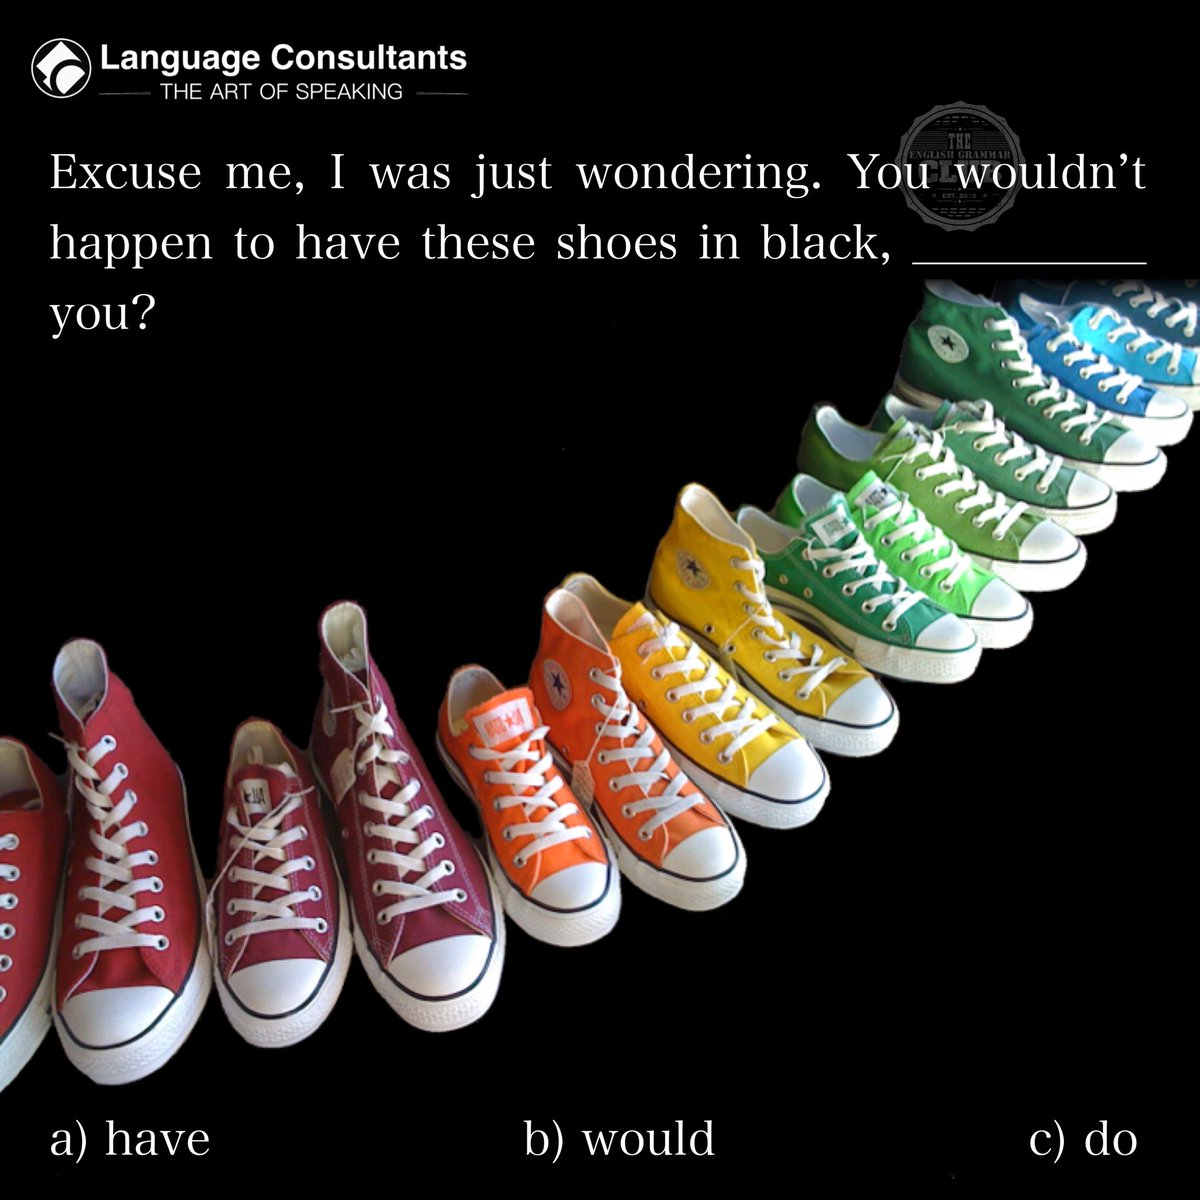 #english 🇬🇧 #englishlearning #learnenglish #languagelearning #englishonline #italianonline #language #consultants #business #shoes #trainers #allstars #shoeshopping #shoeshop #allstarshoes #blackshoes #style